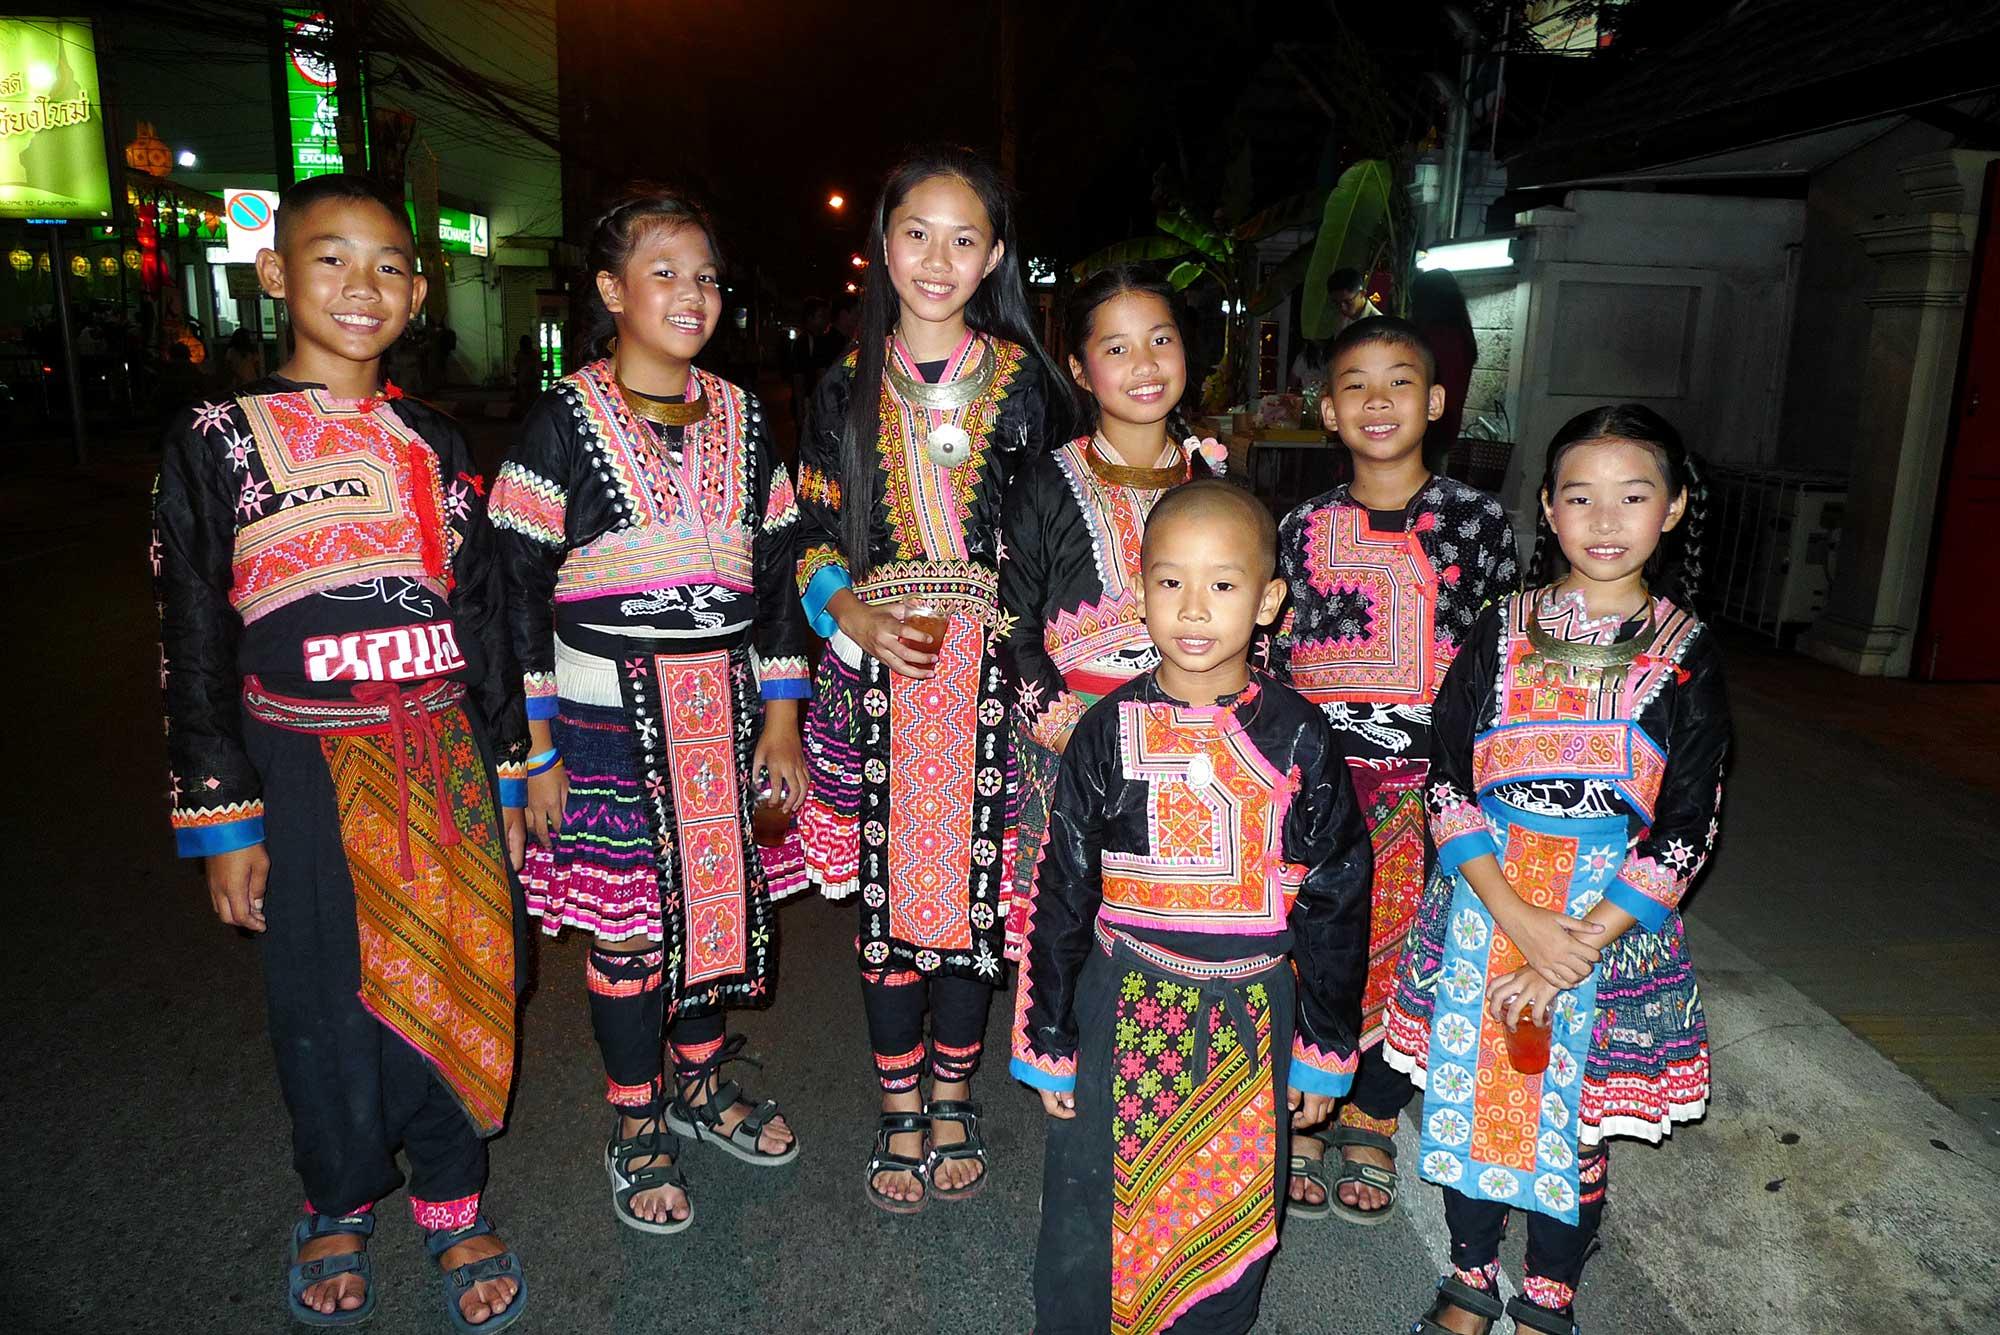 Yee peng and Loy Krathong festival 2020